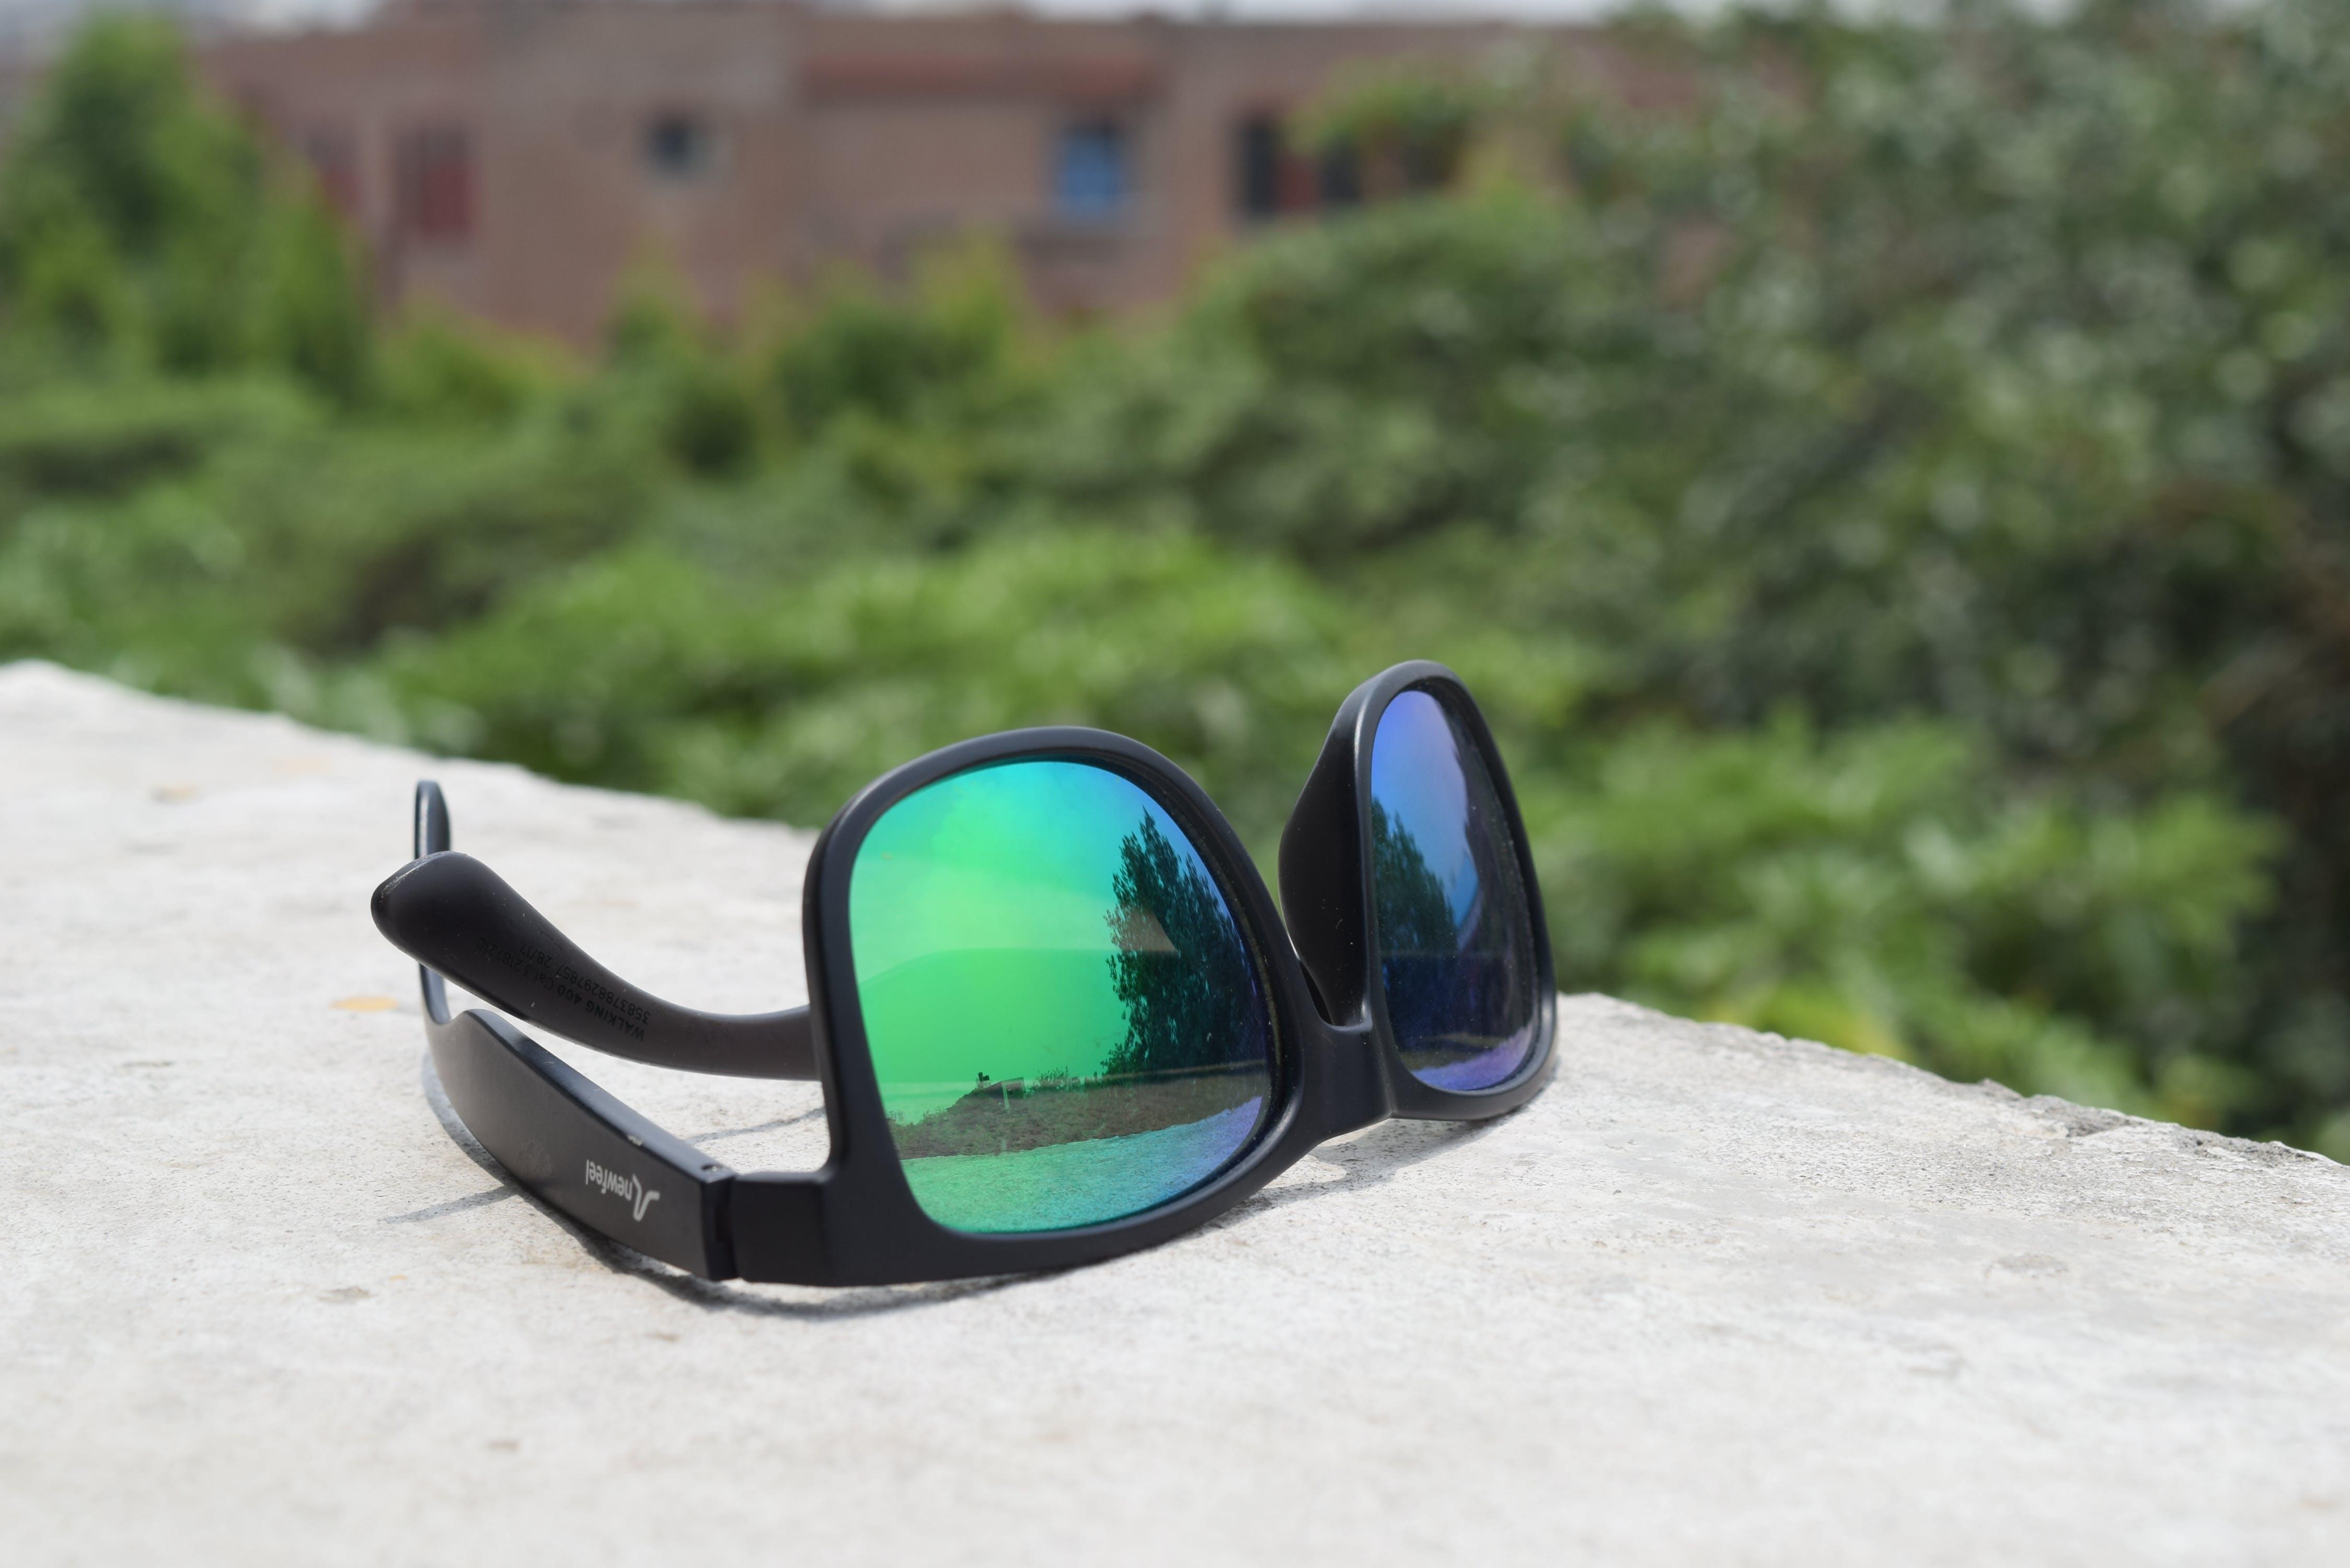 Free stock photo of colorful sunglasses, eye glasses, eyeglasses, green